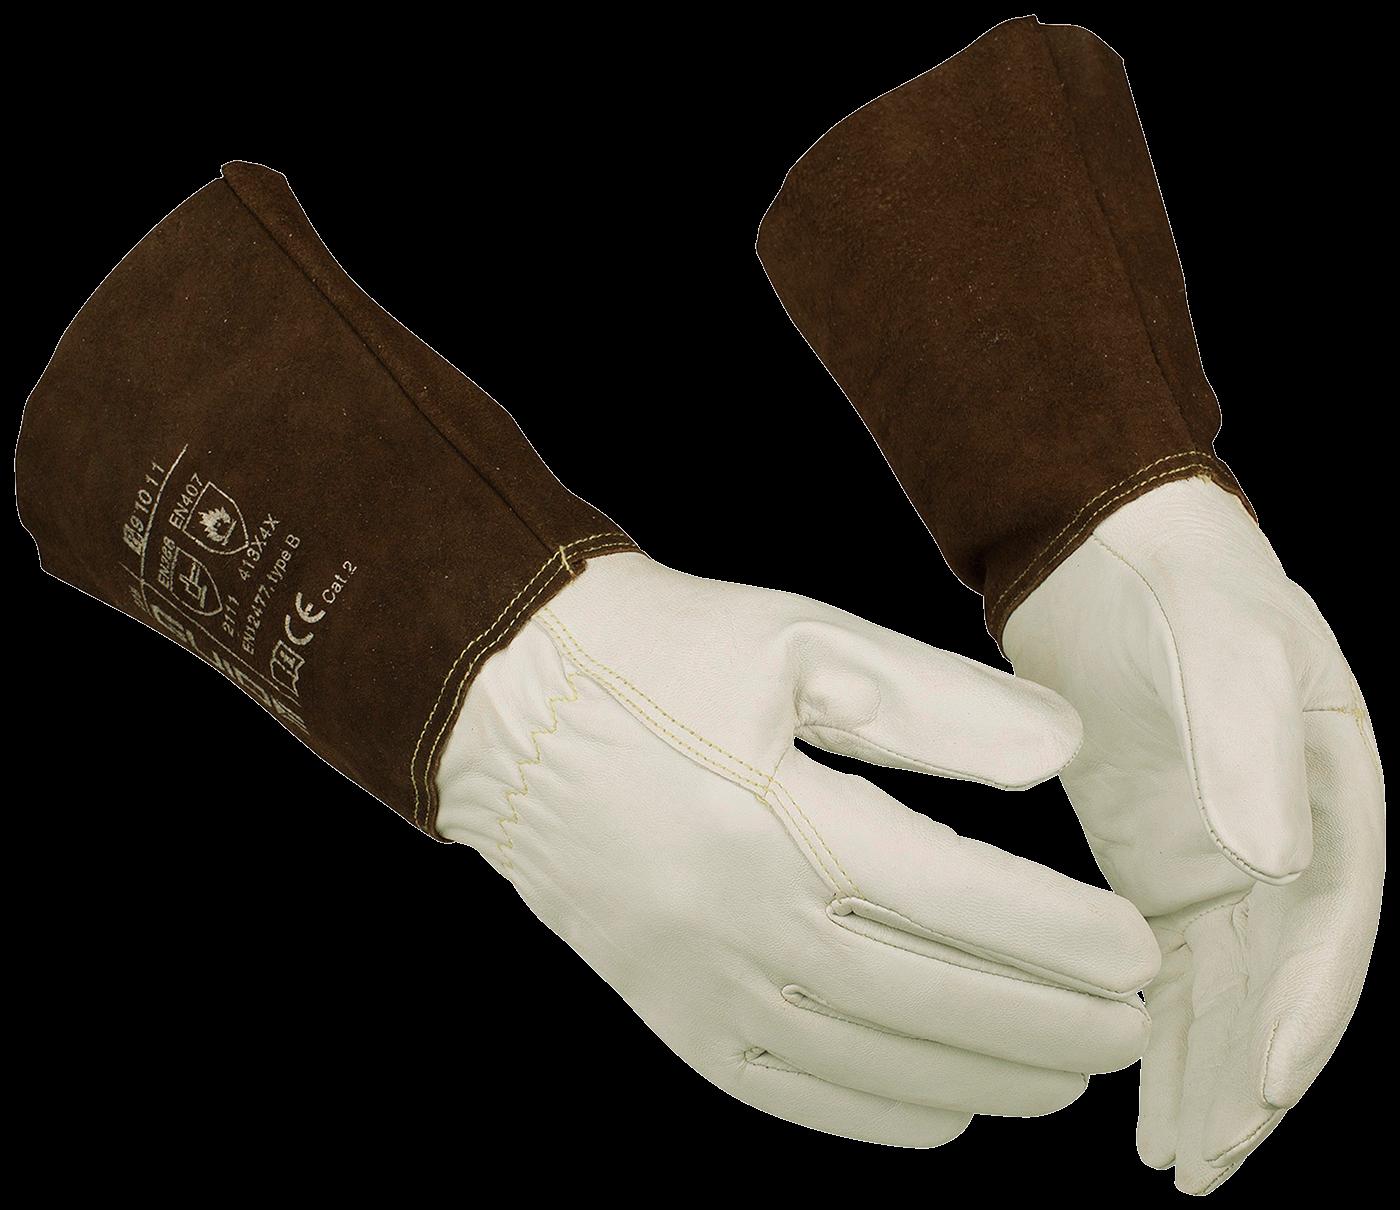 Welding Glove GUIDE 225